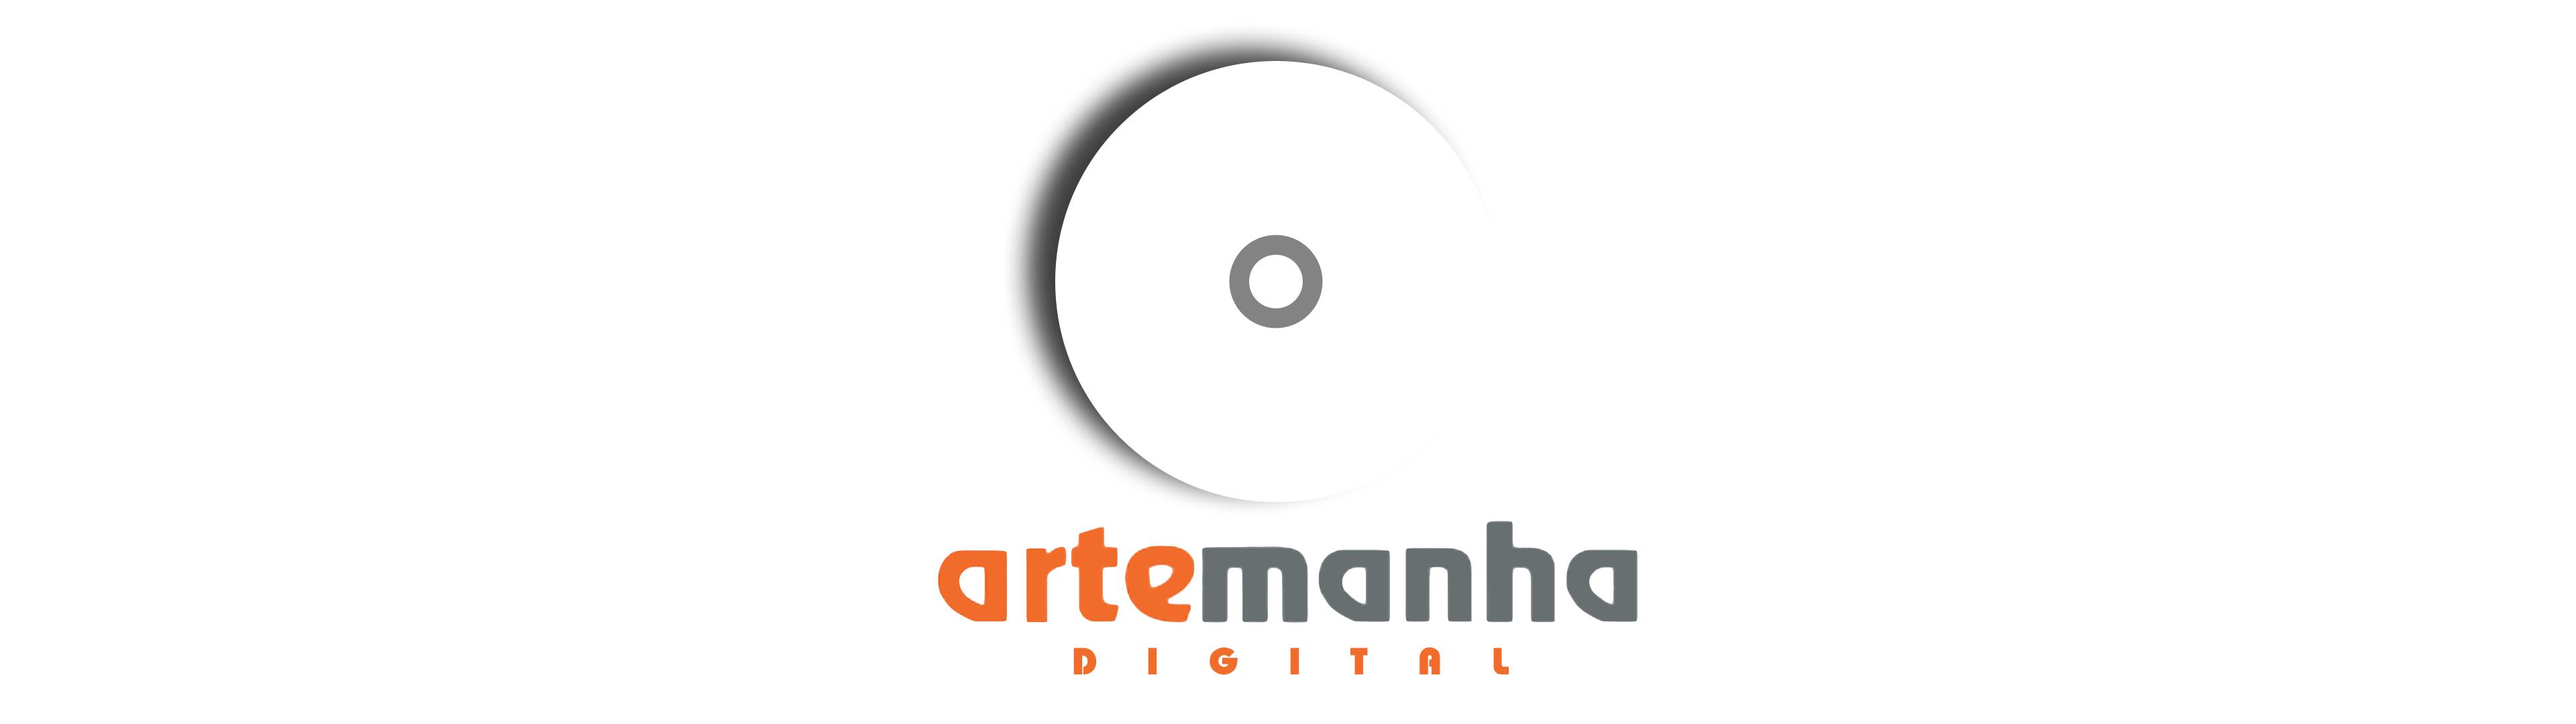 ARTEMANHA DIGITAL